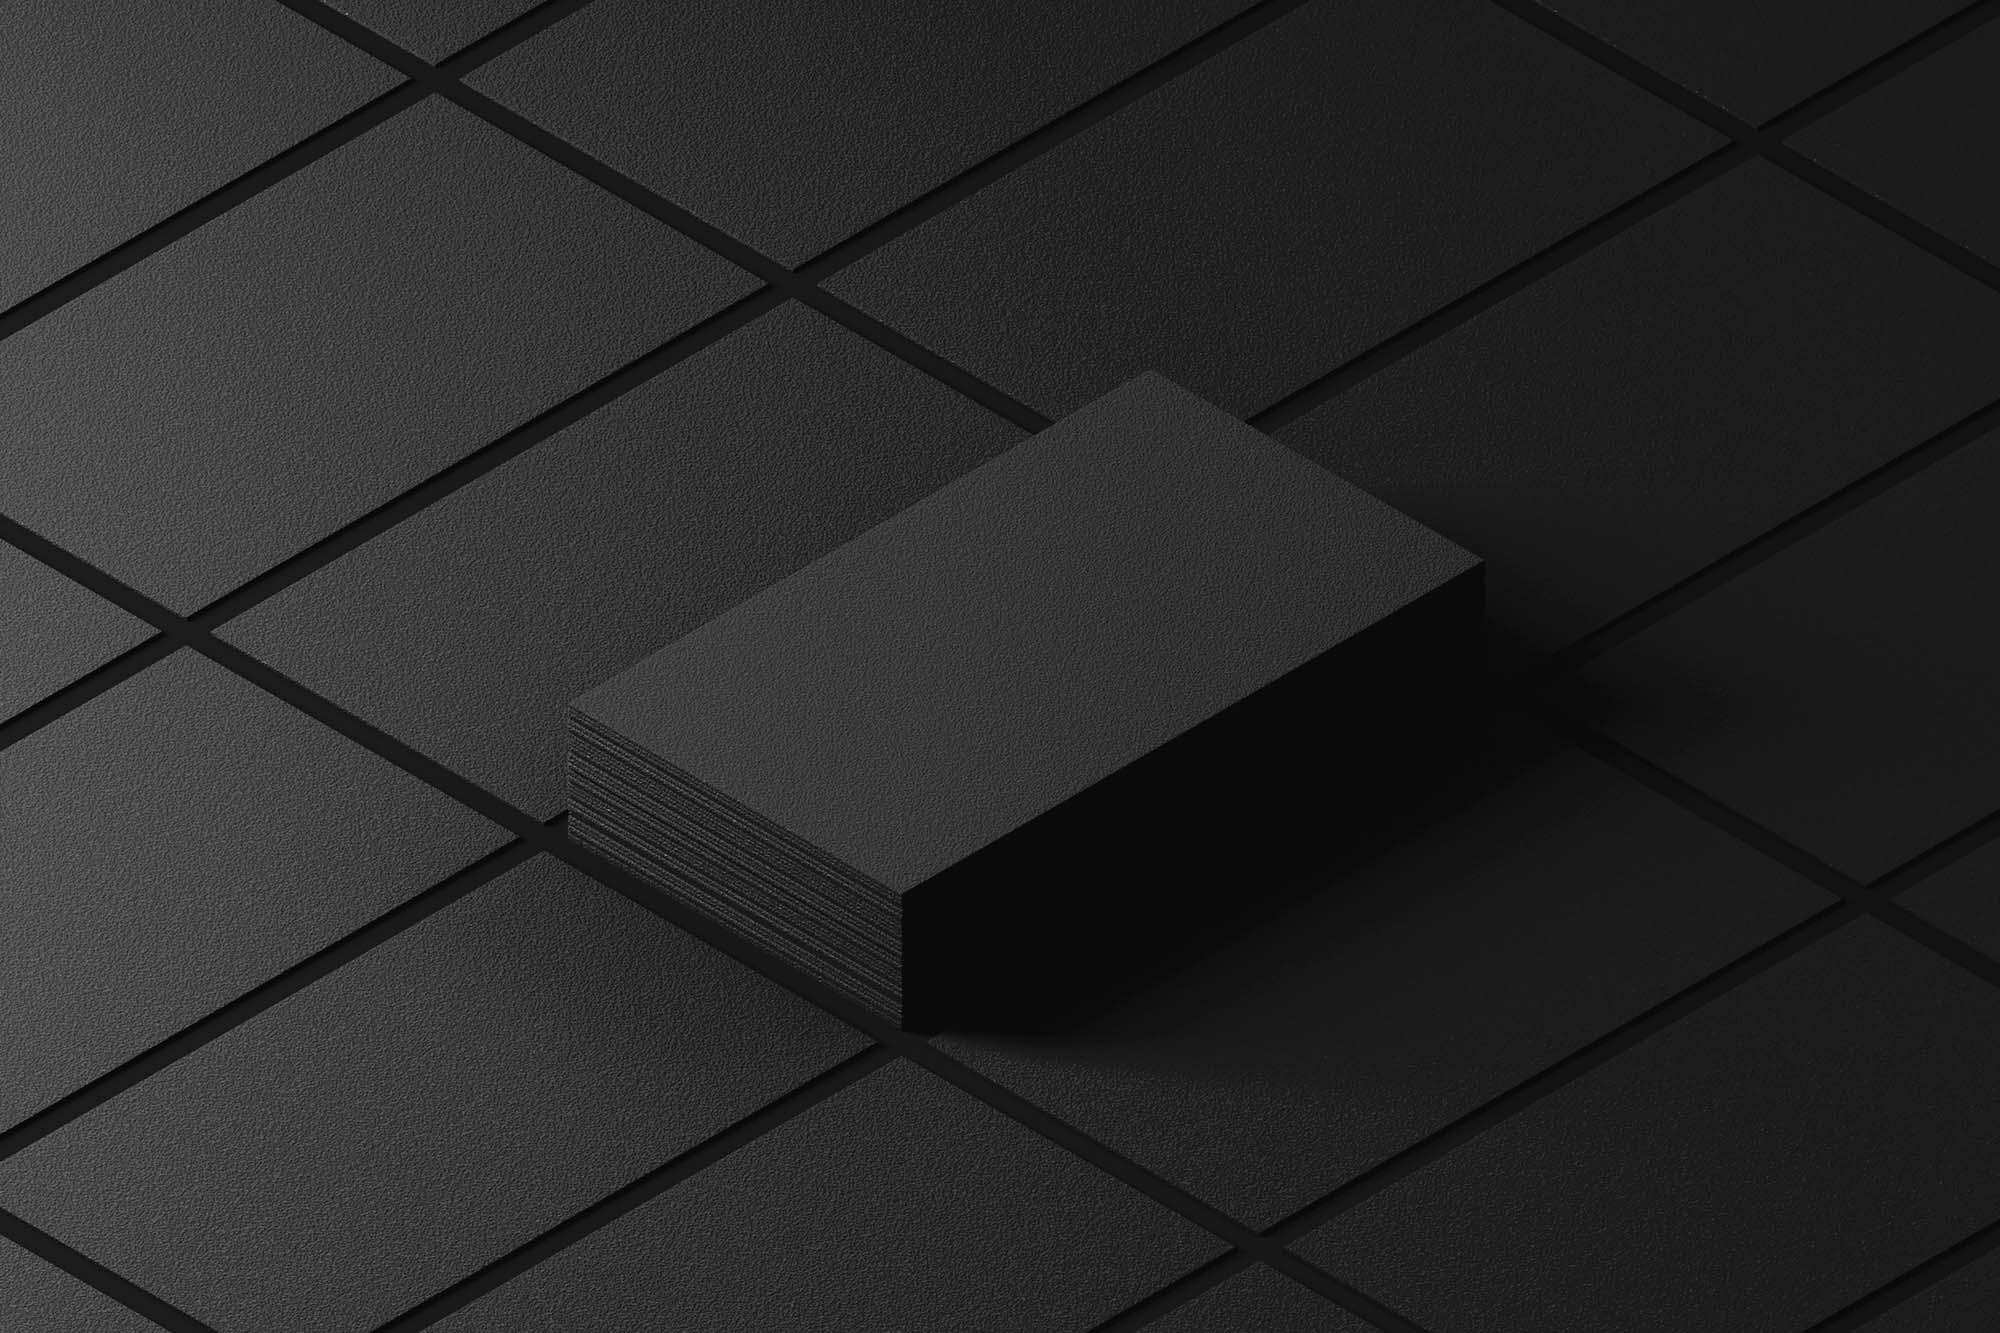 Dark Isometric Business Cards Mockup 2